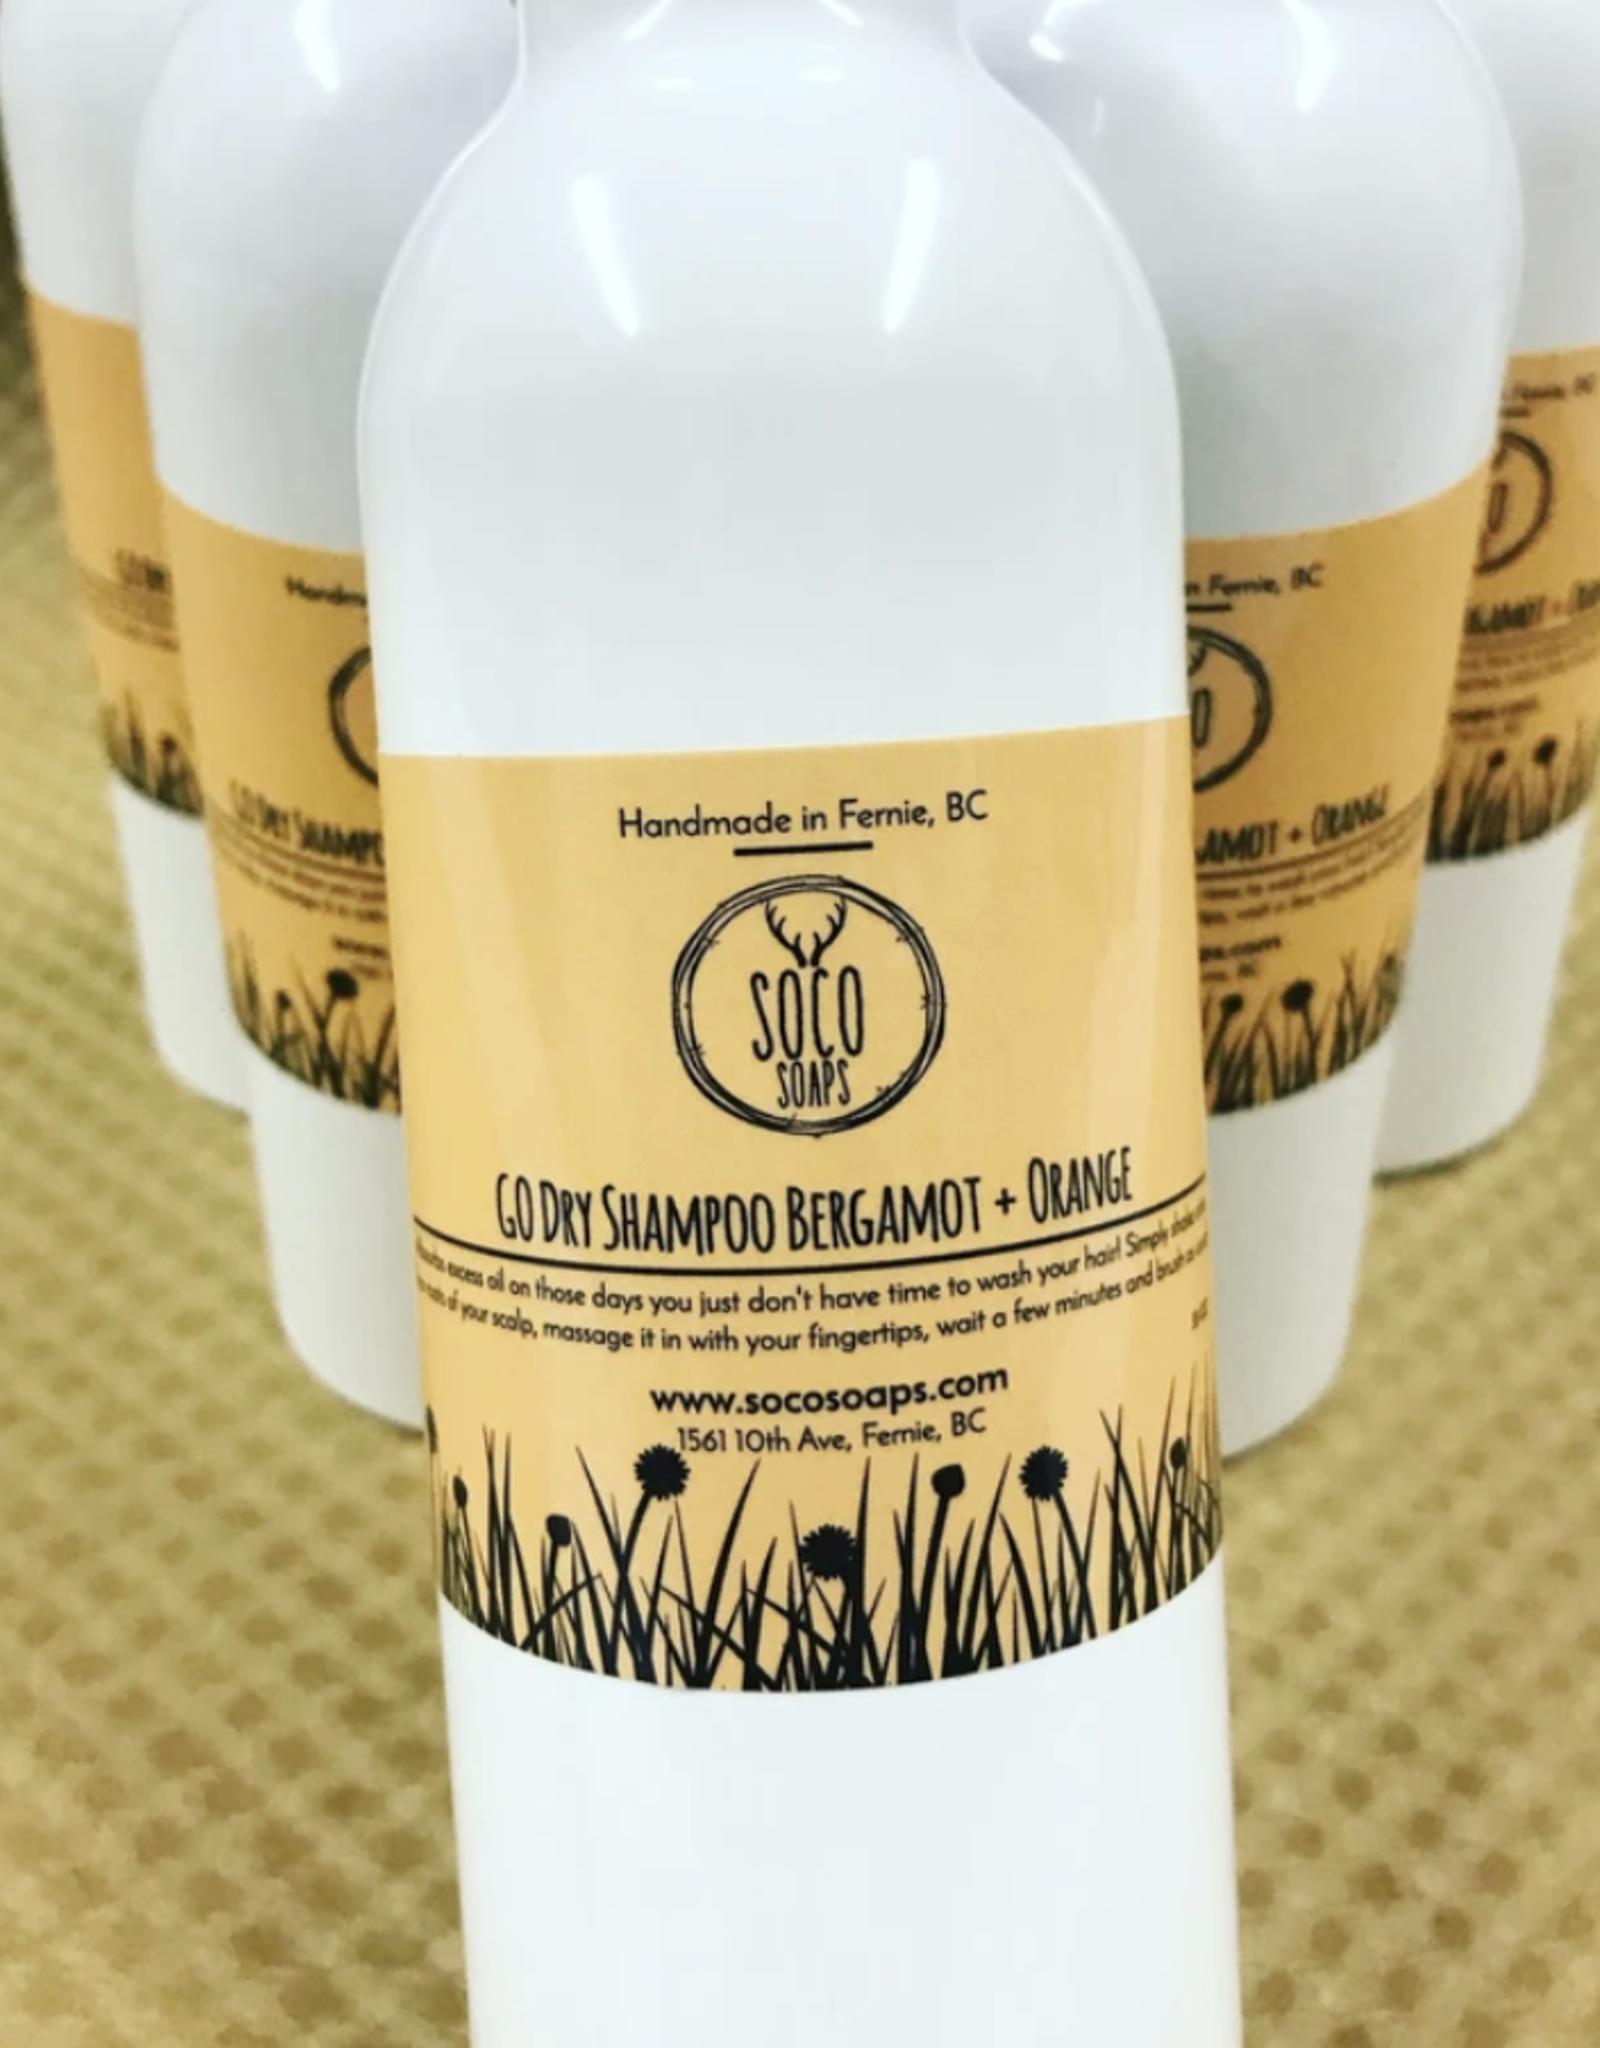 Go Dry Shampoo - Bergamot + Orange